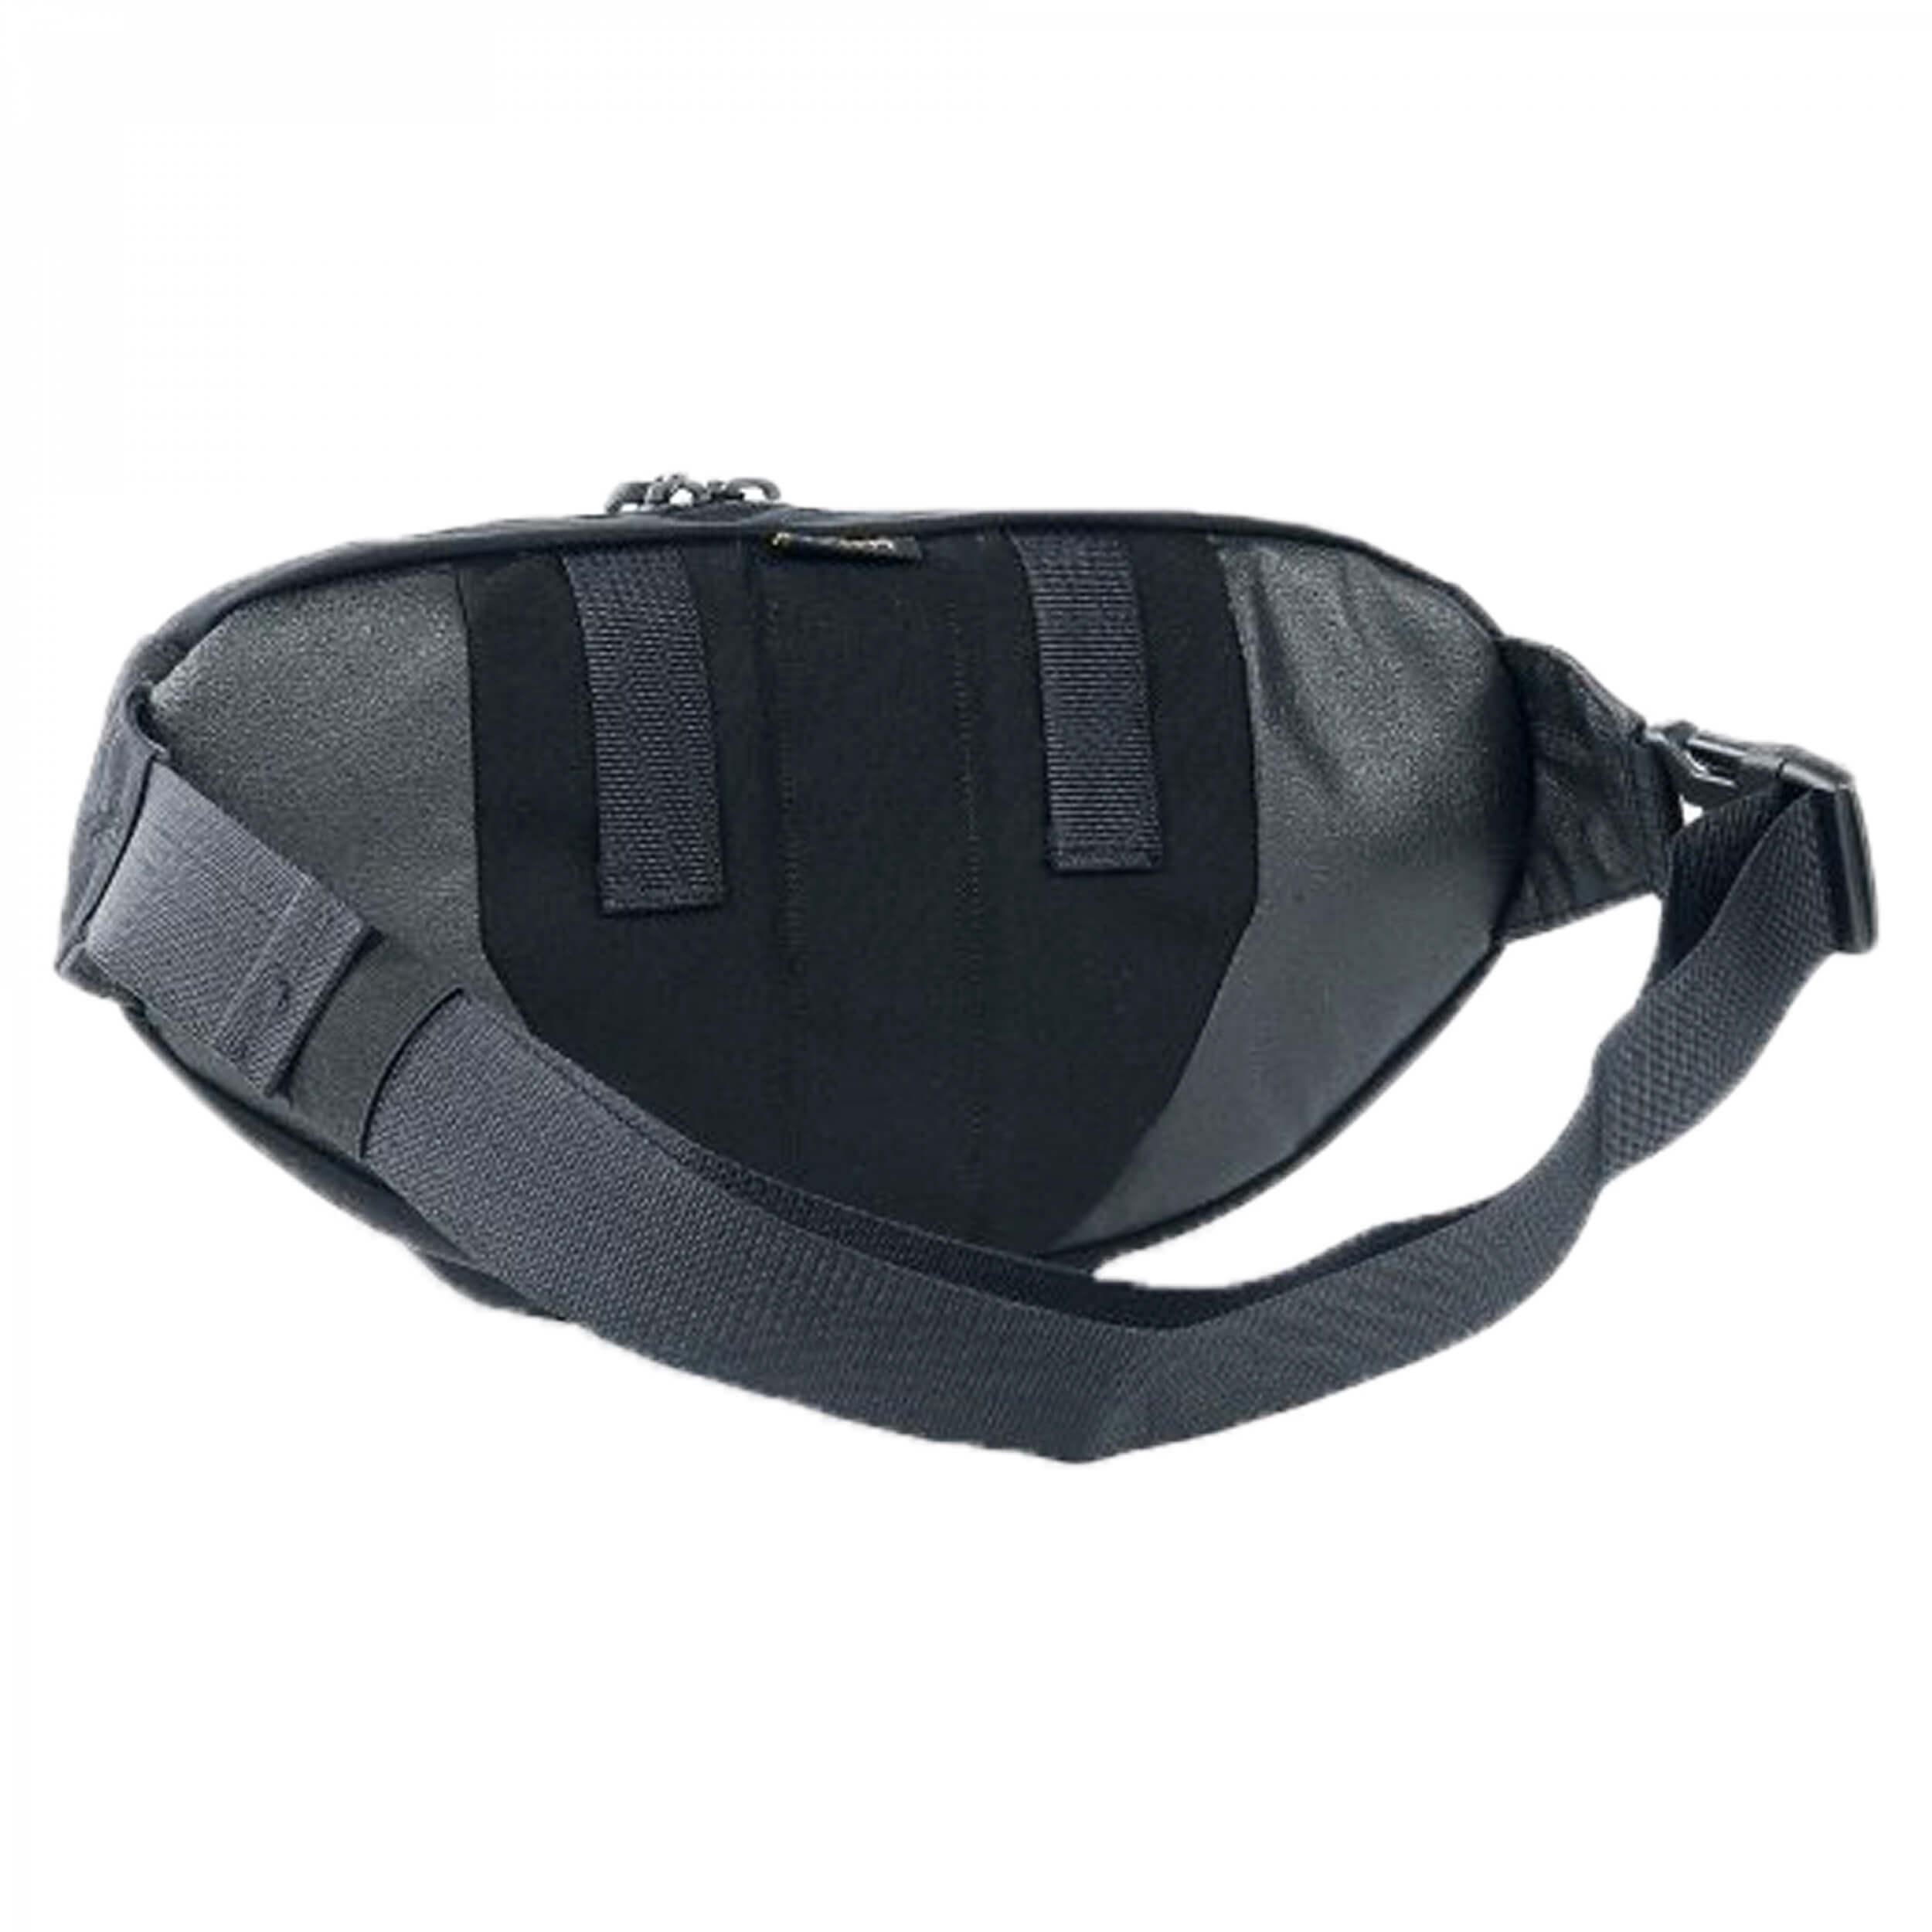 Tasmanian Tiger Hip Bag MK II schwarz